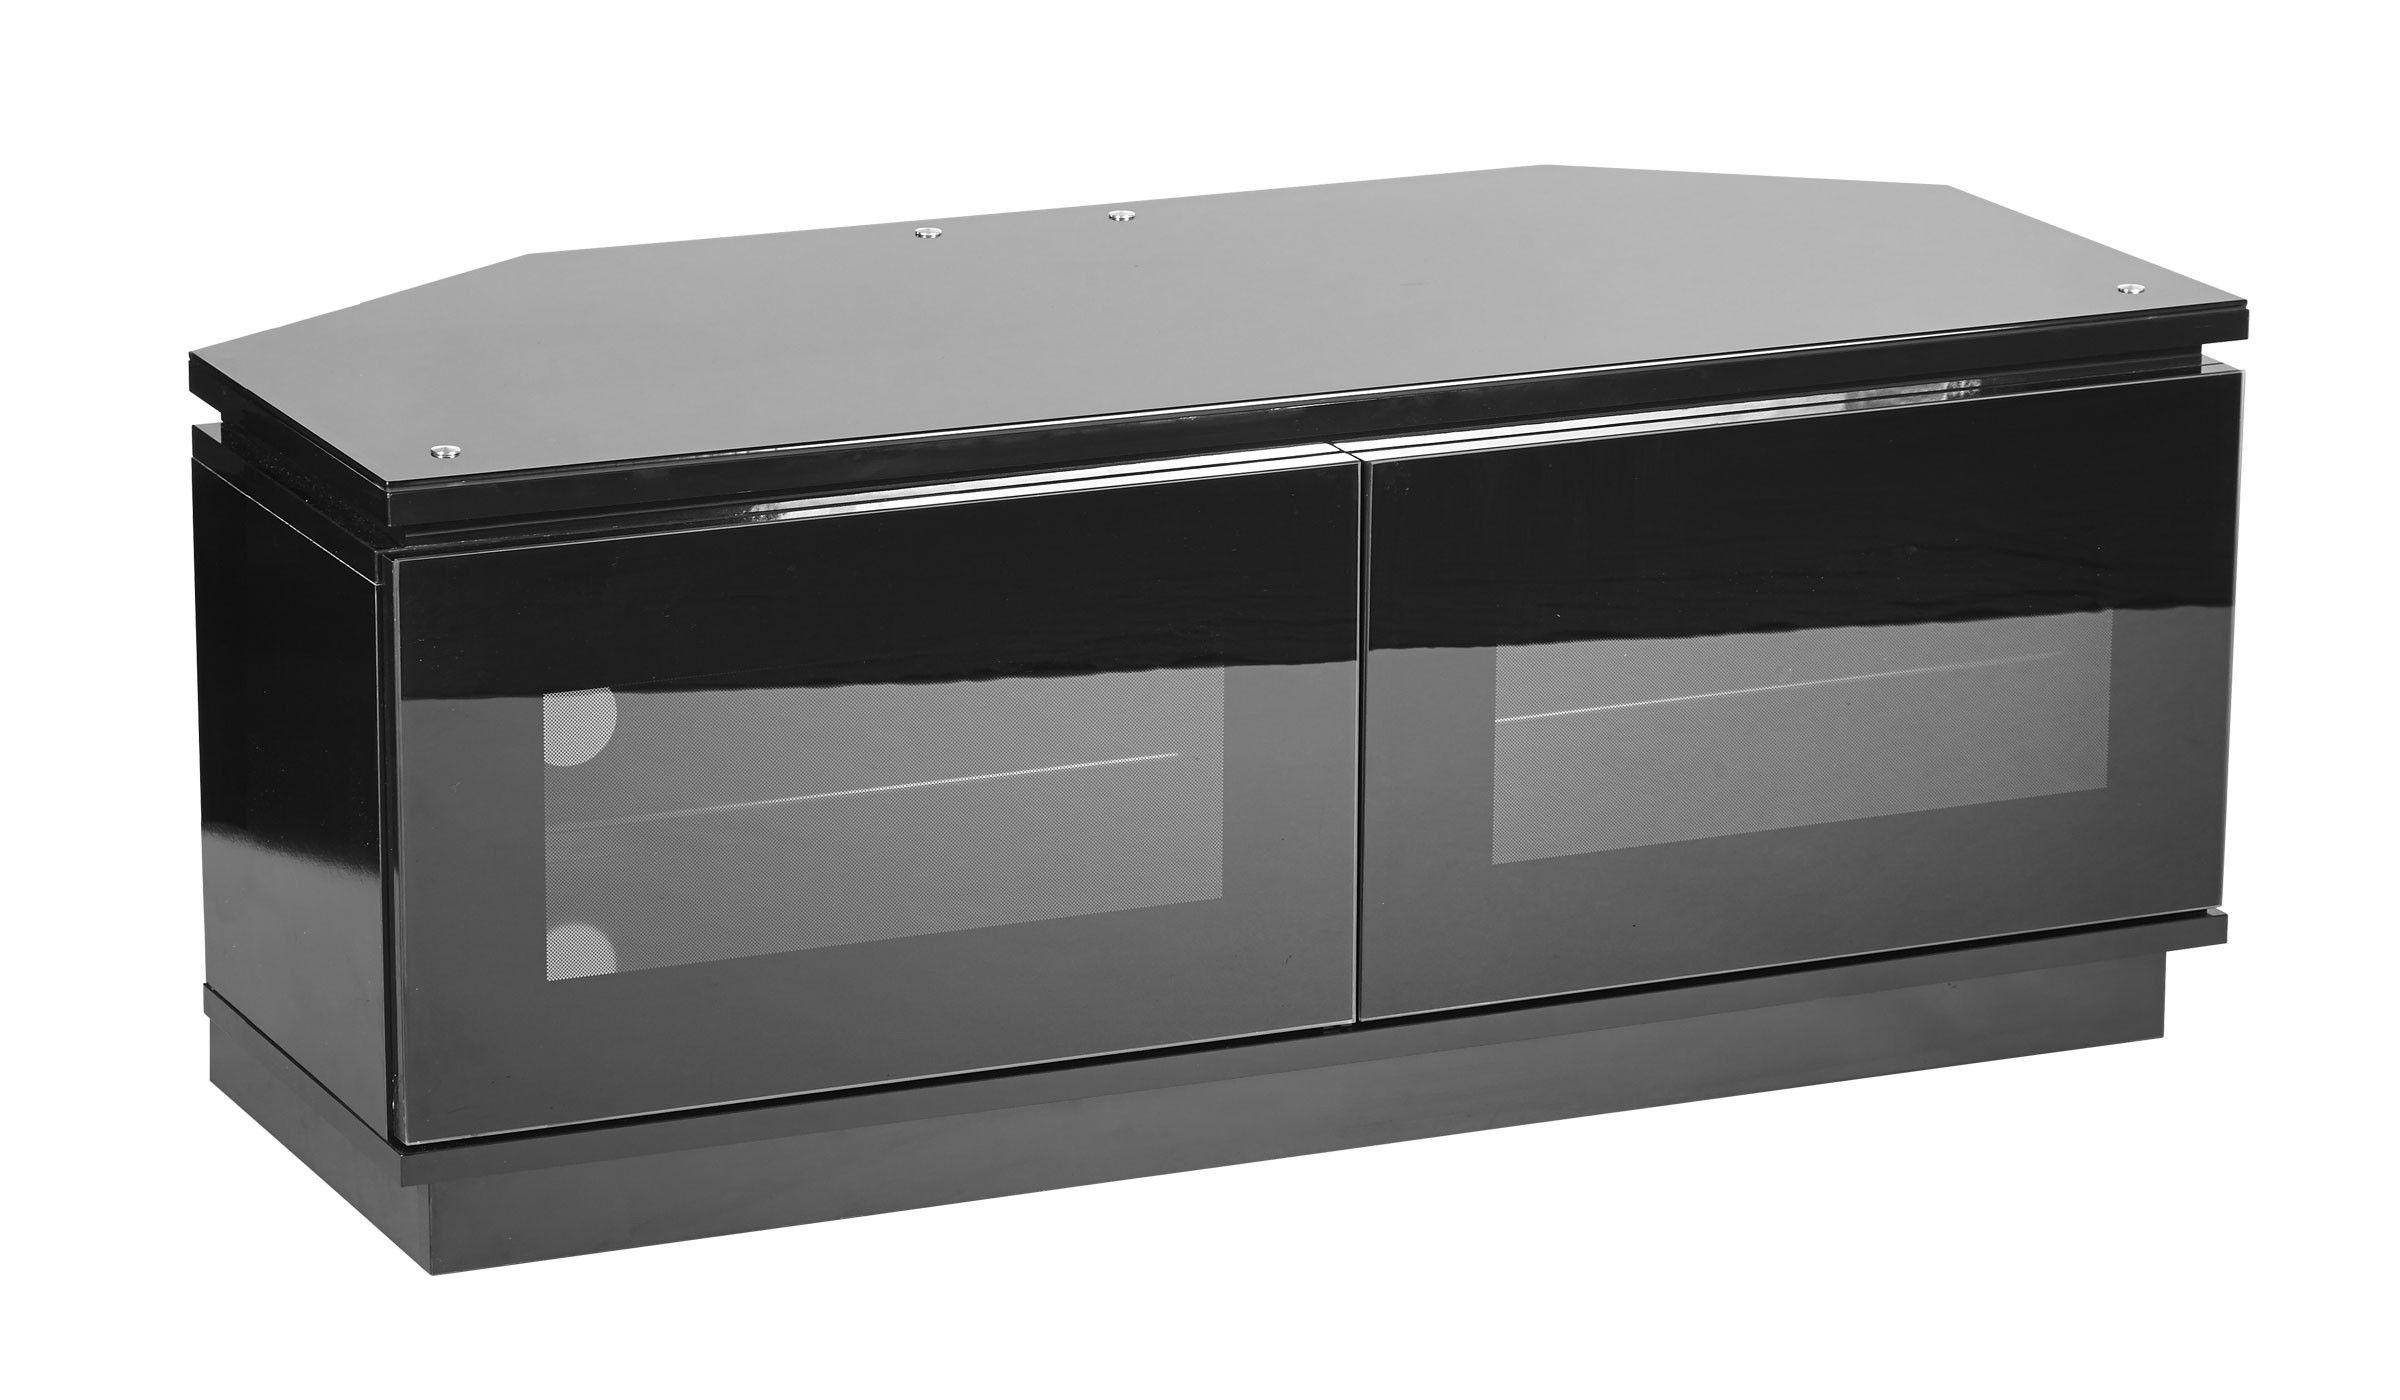 Black Corner TV Unit Up To 50 Inch Flat Screen TV | MMT DC1120